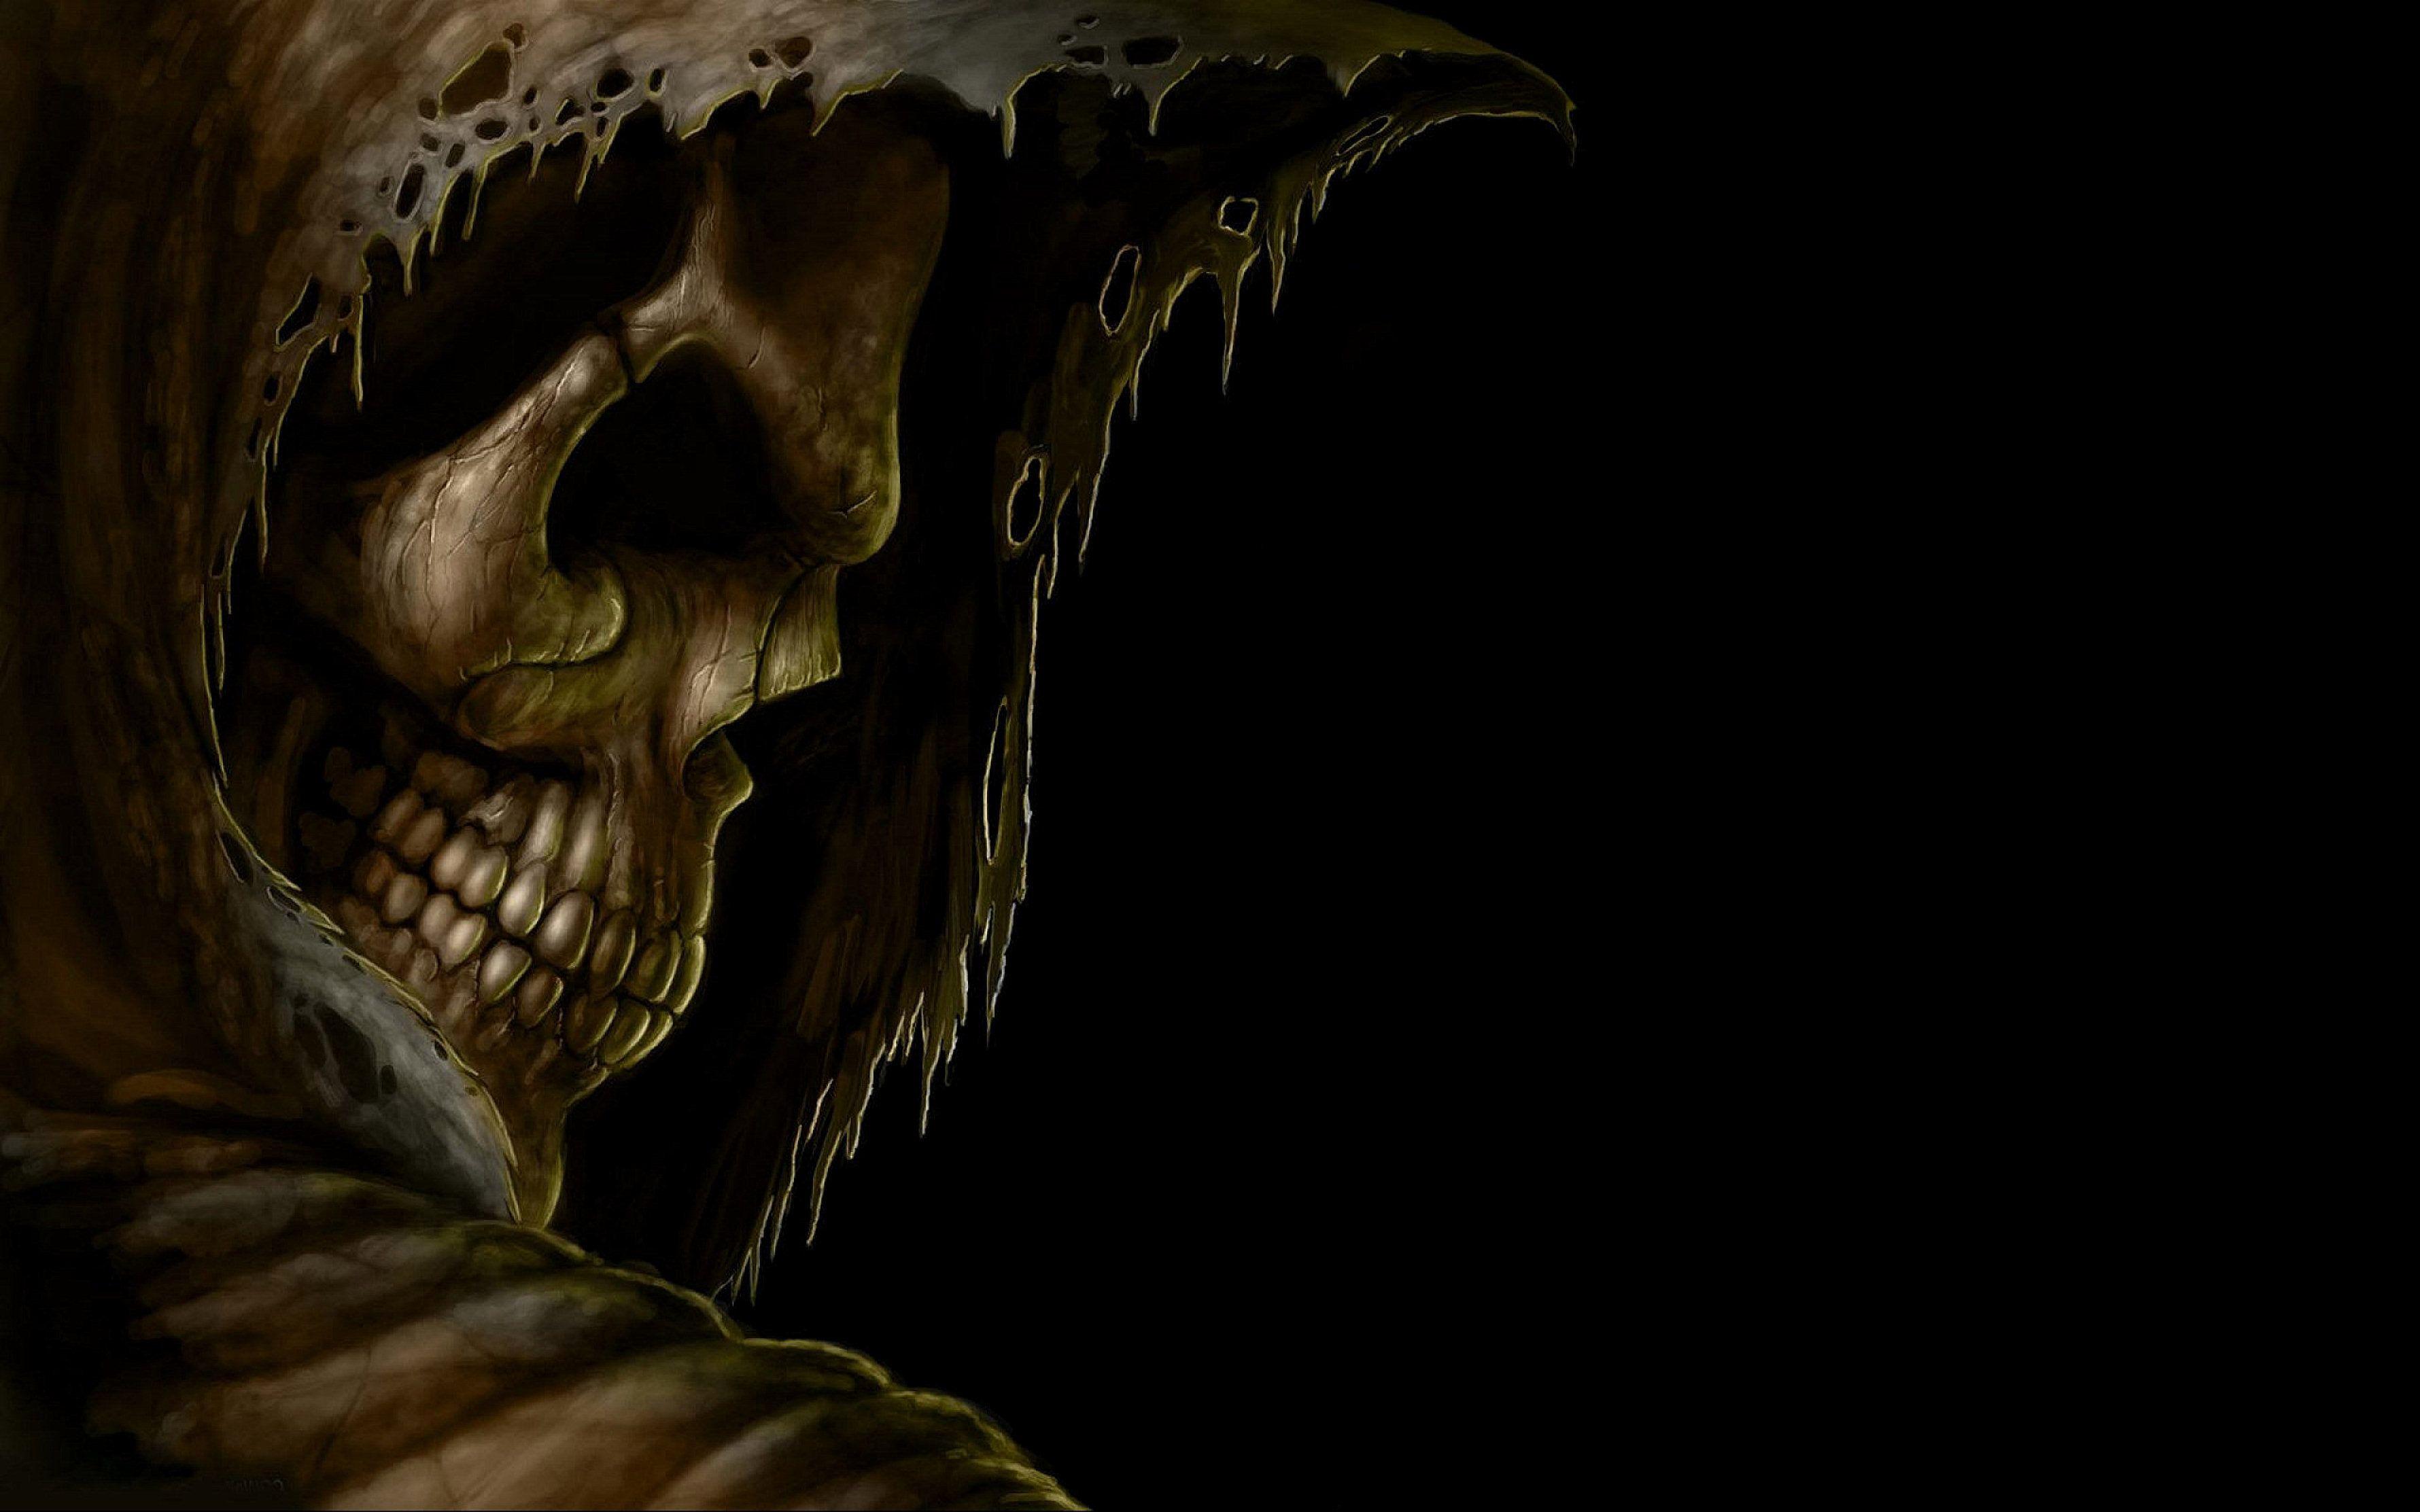 Free Grim Reaper Wallpaper Background Grim Reaper Reaper Death